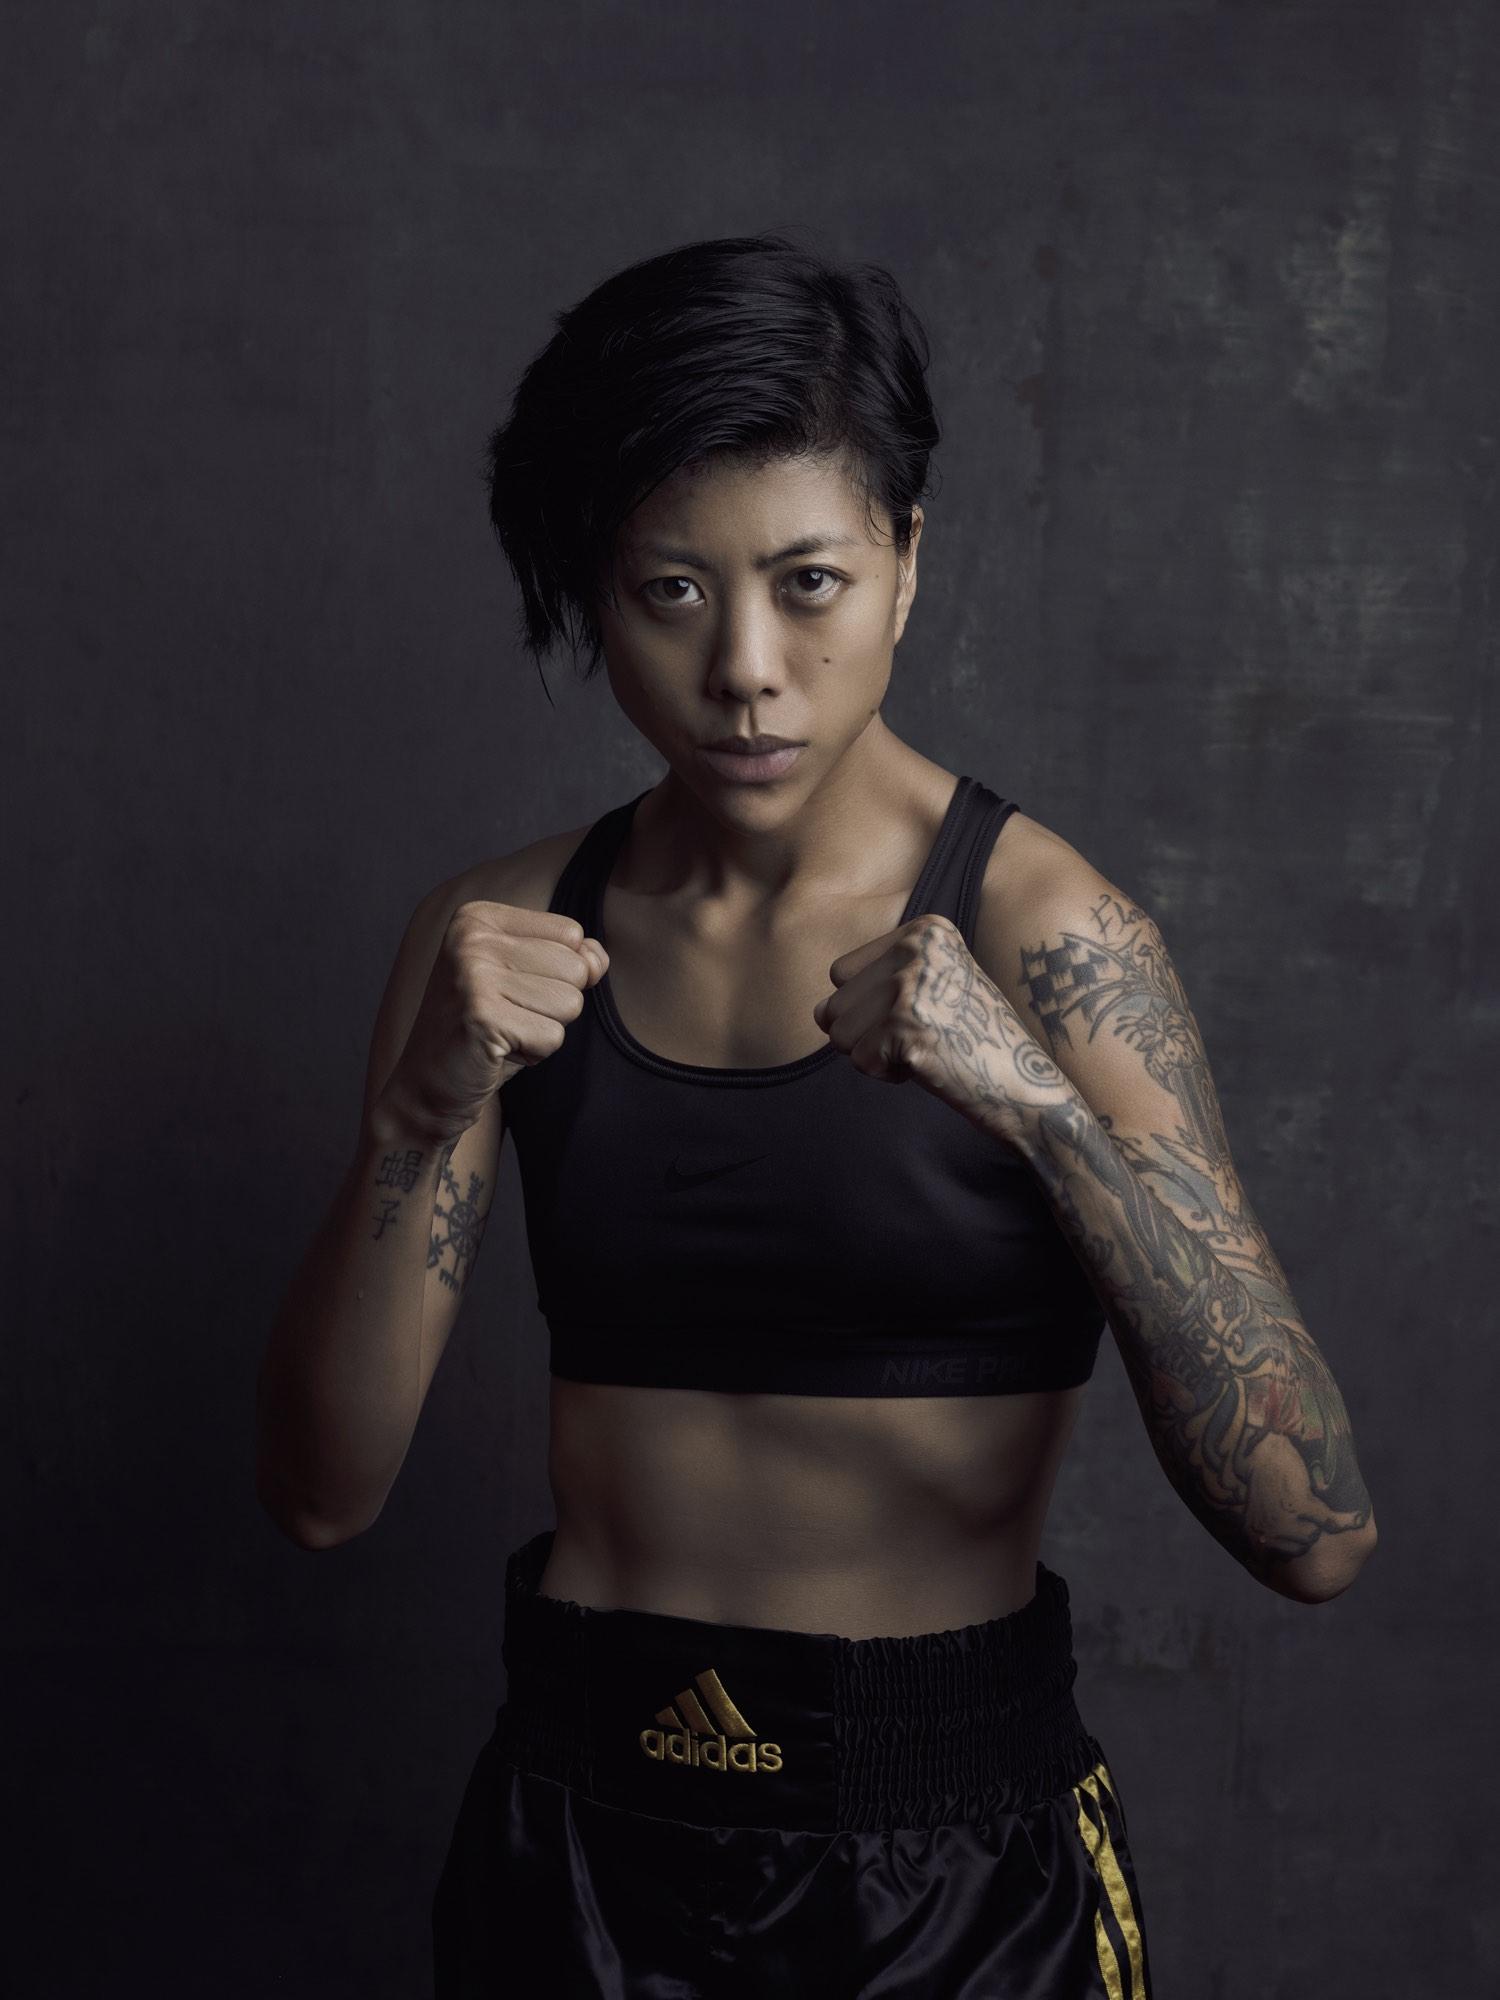 Fashion photography studio singapore services asia photographer photoshoot model woman boxe adidas